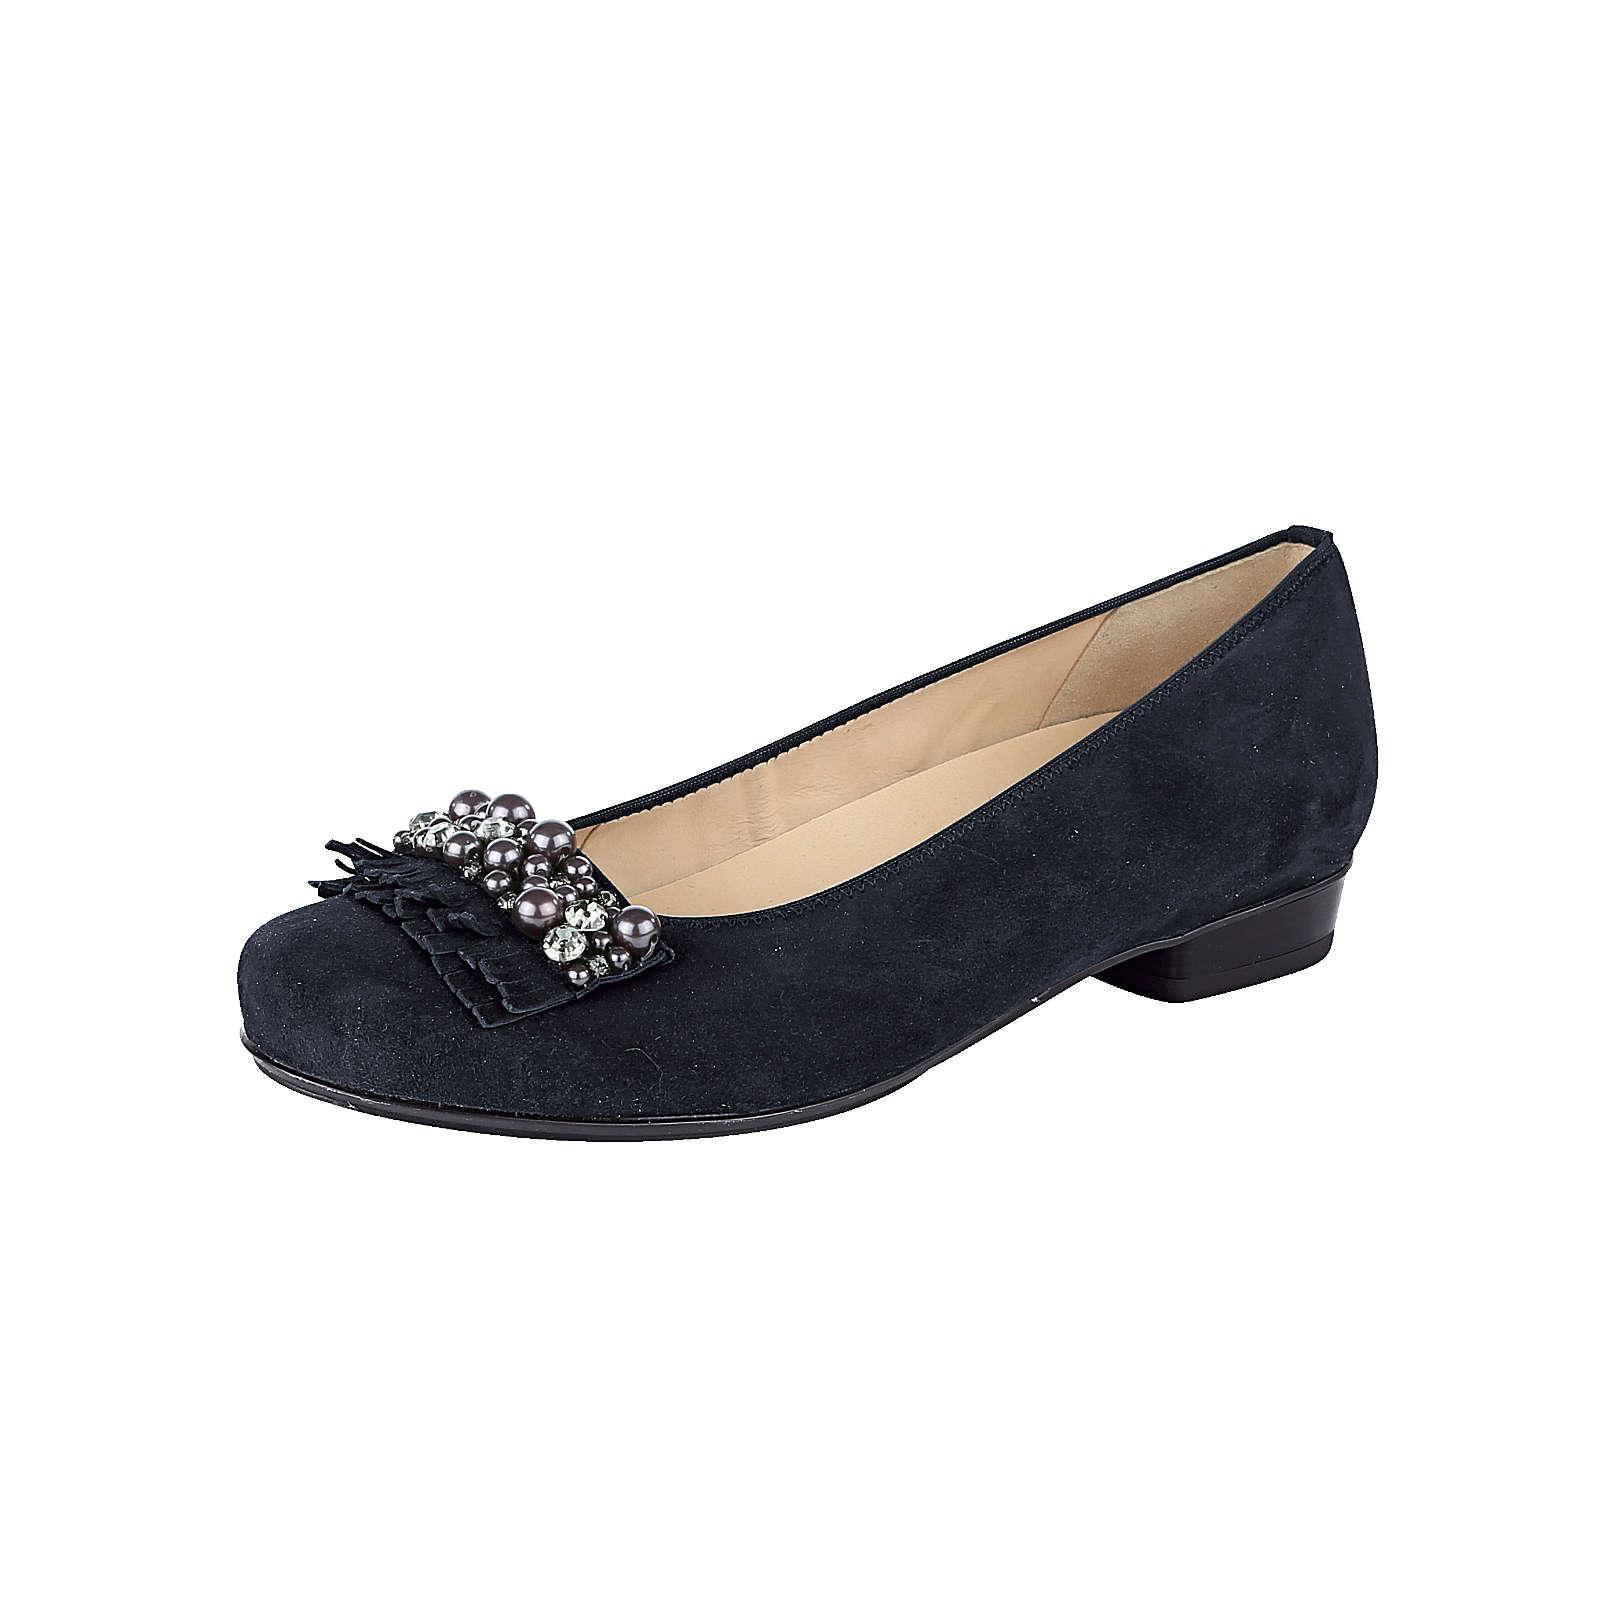 ara Klassische Ballerinas dunkelblau Damen Gr. 41